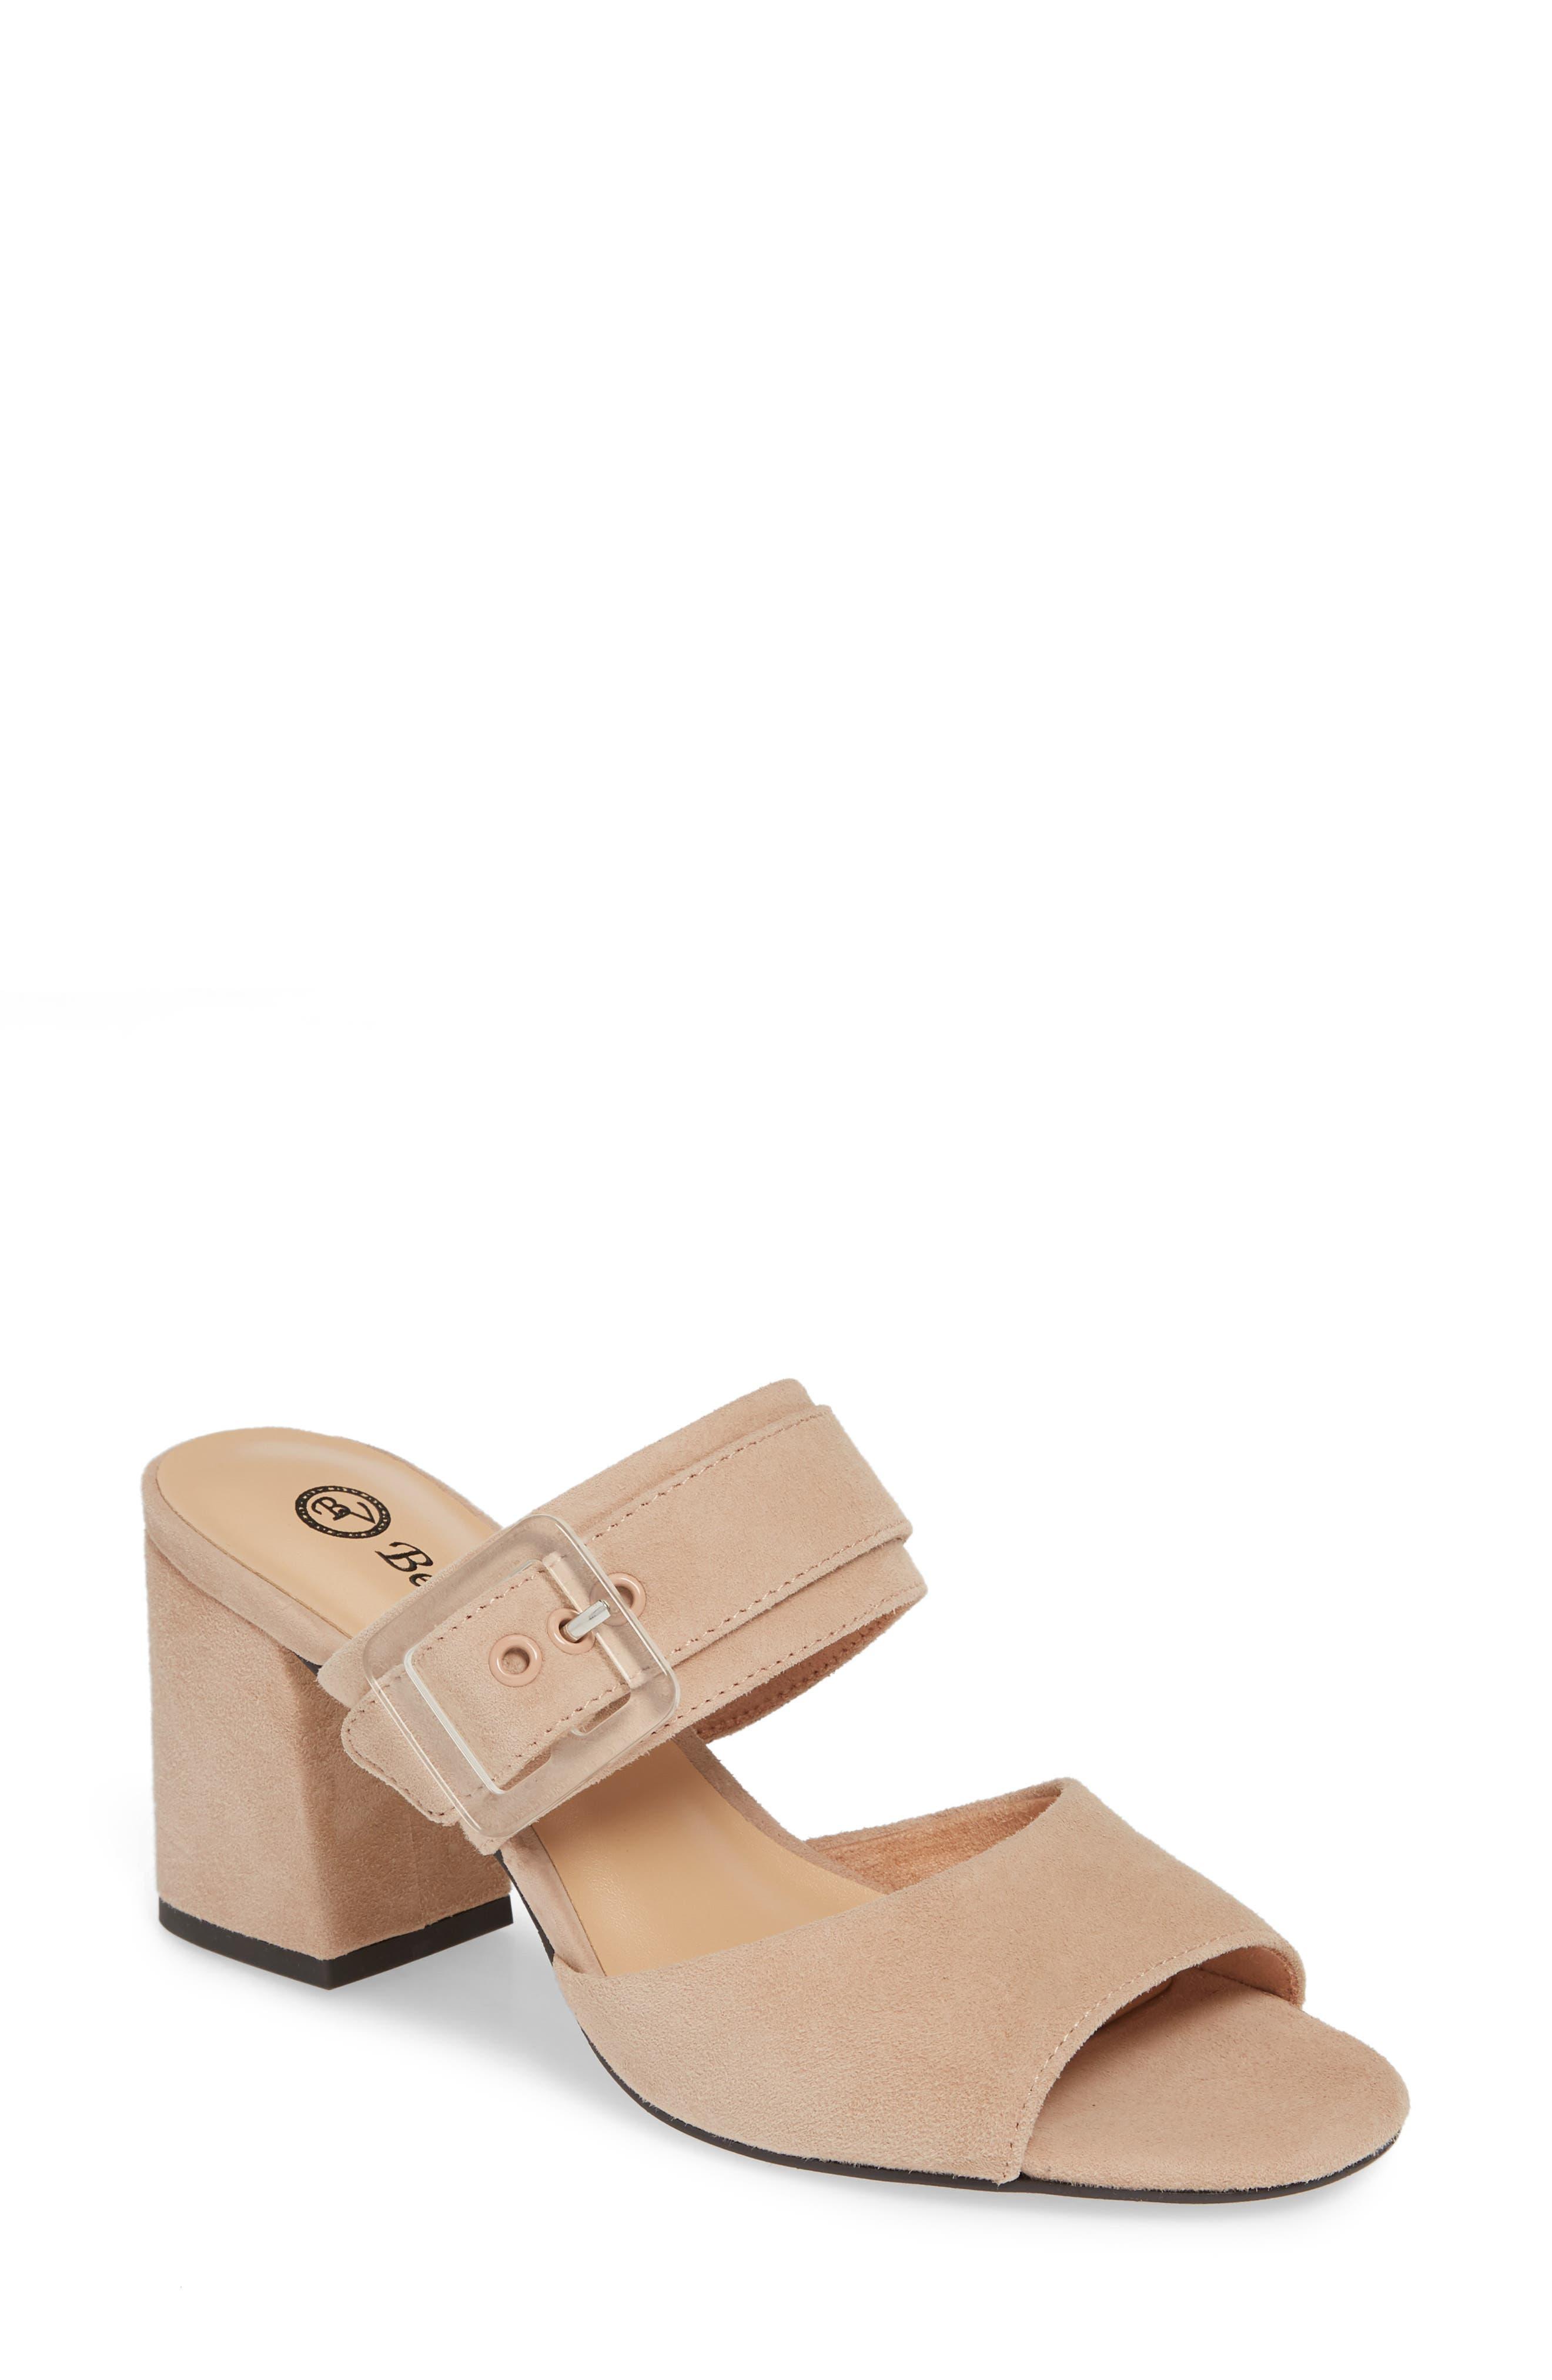 BELLA VITA Tory Buckle Slide Sandal, Main, color, BLUSH SUEDE